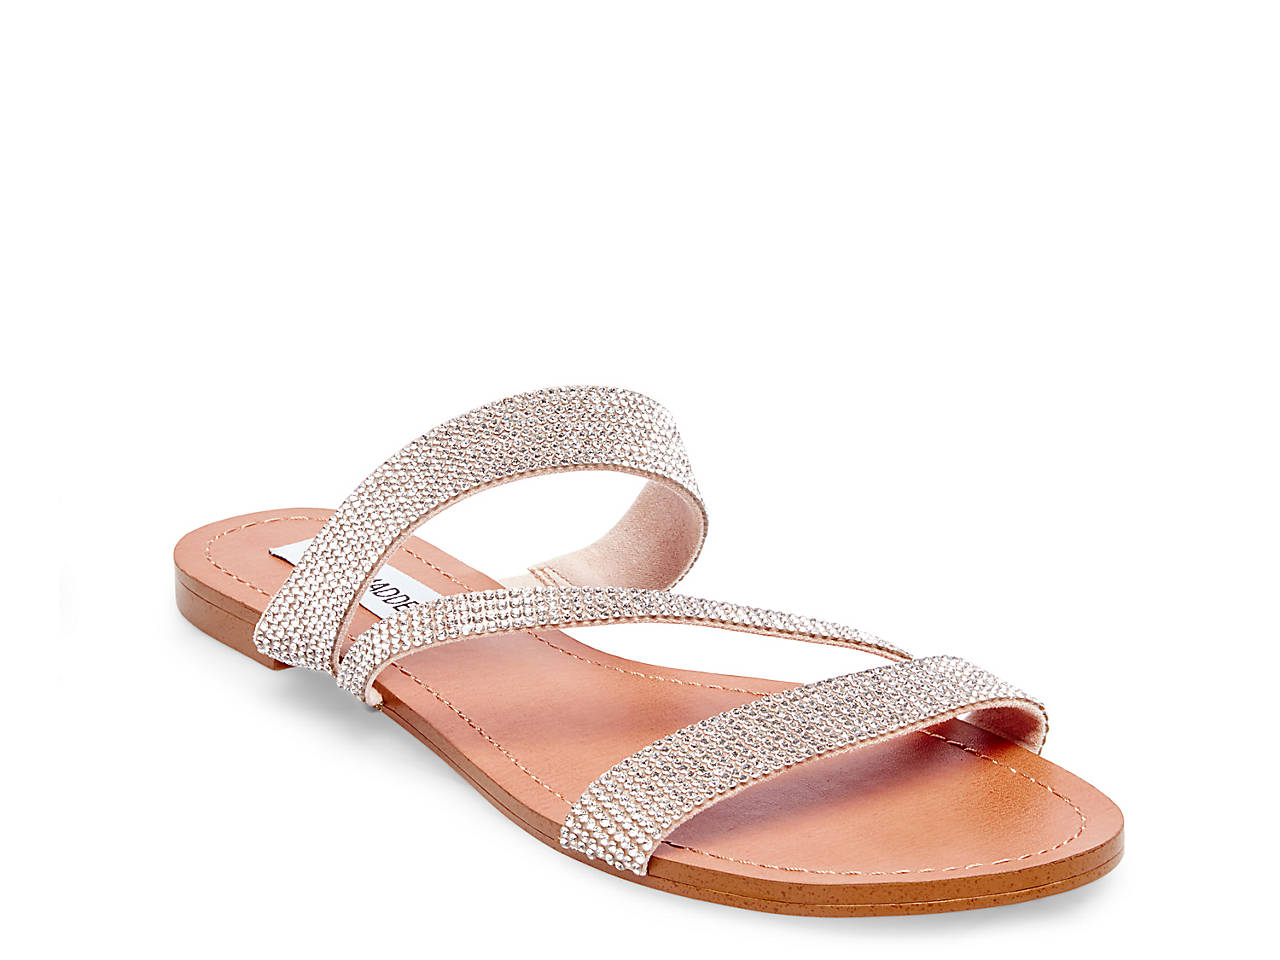 f8787b2ca41 Steve Madden Lorie Flat Sandal Women s Shoes